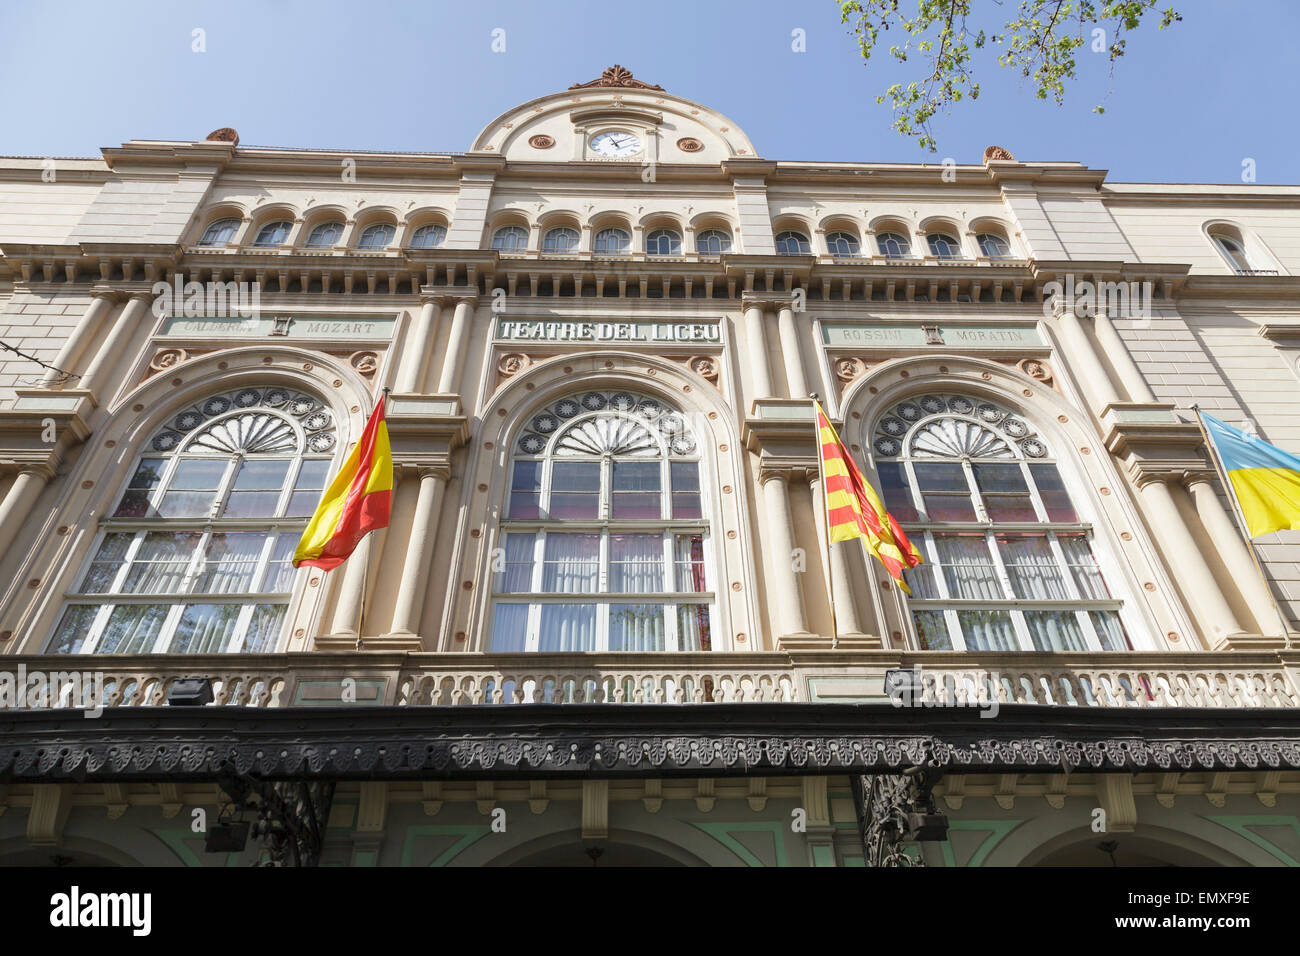 Teatre del Liceu, Barcelona, Catalonia, Spain - Stock Image